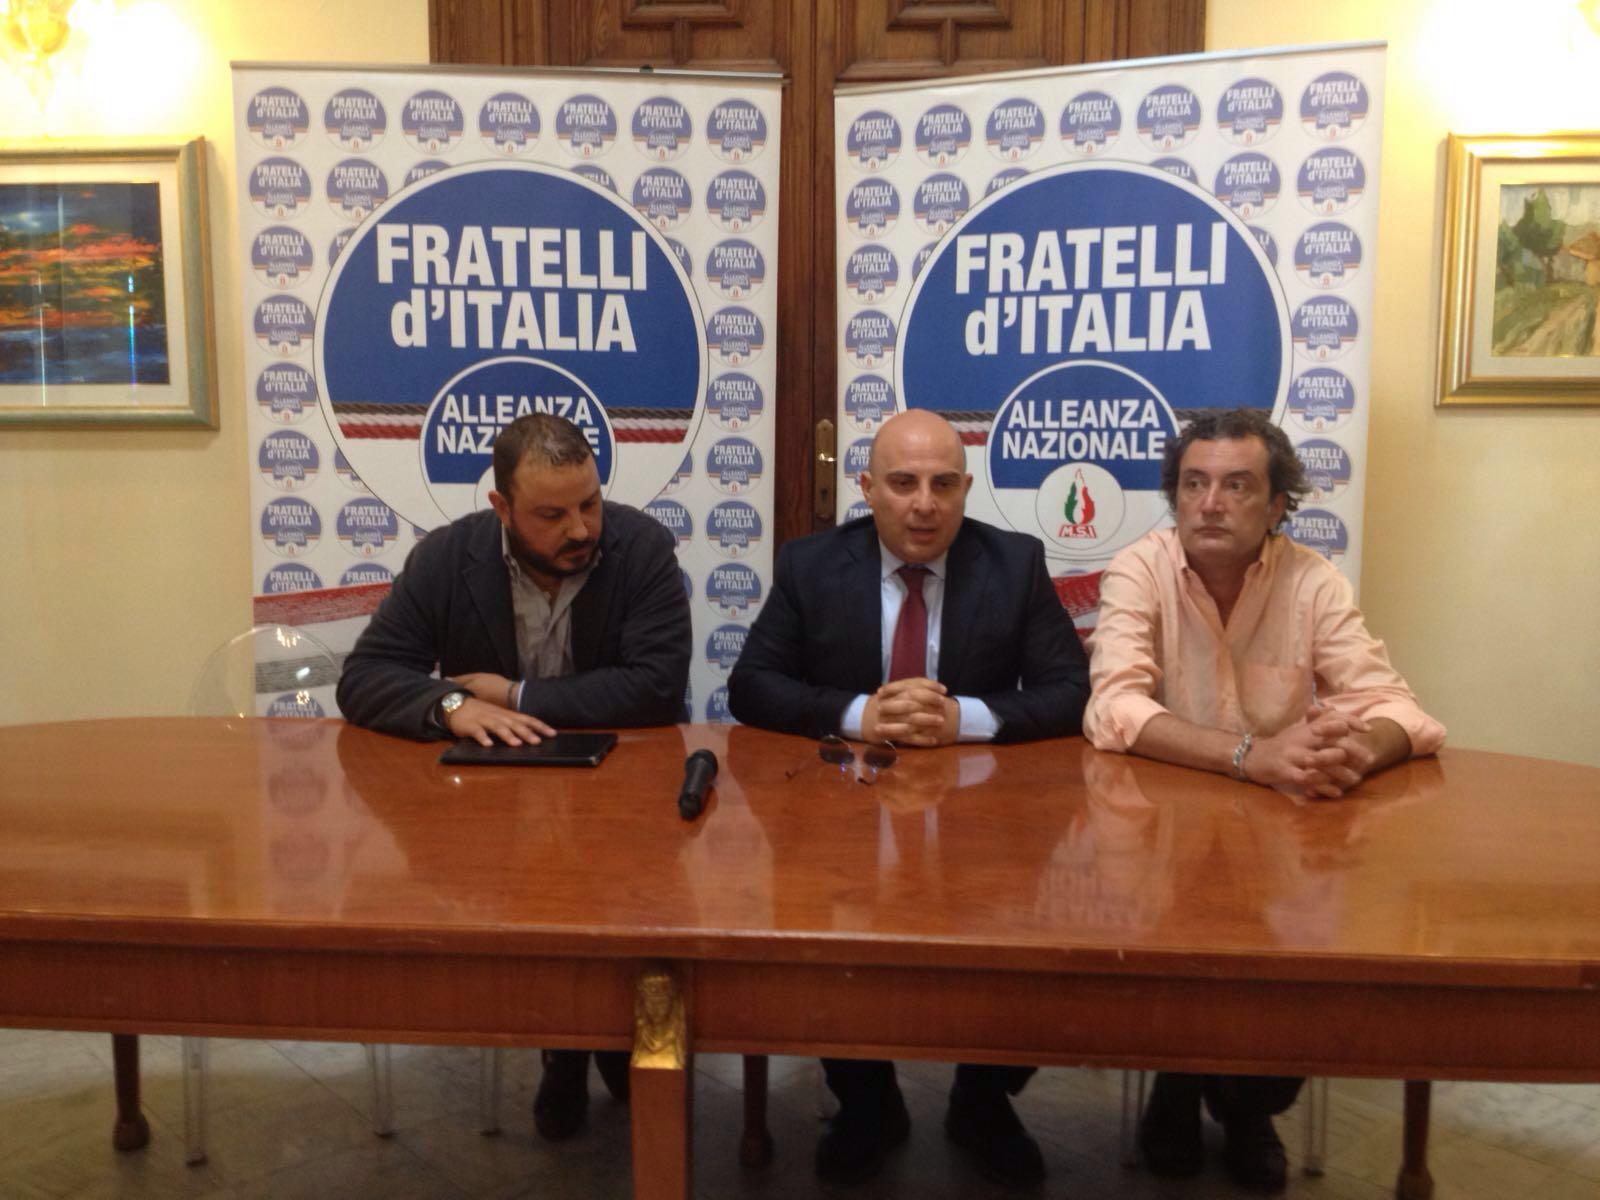 Fratelli d'Italia An su Gioia Tauro